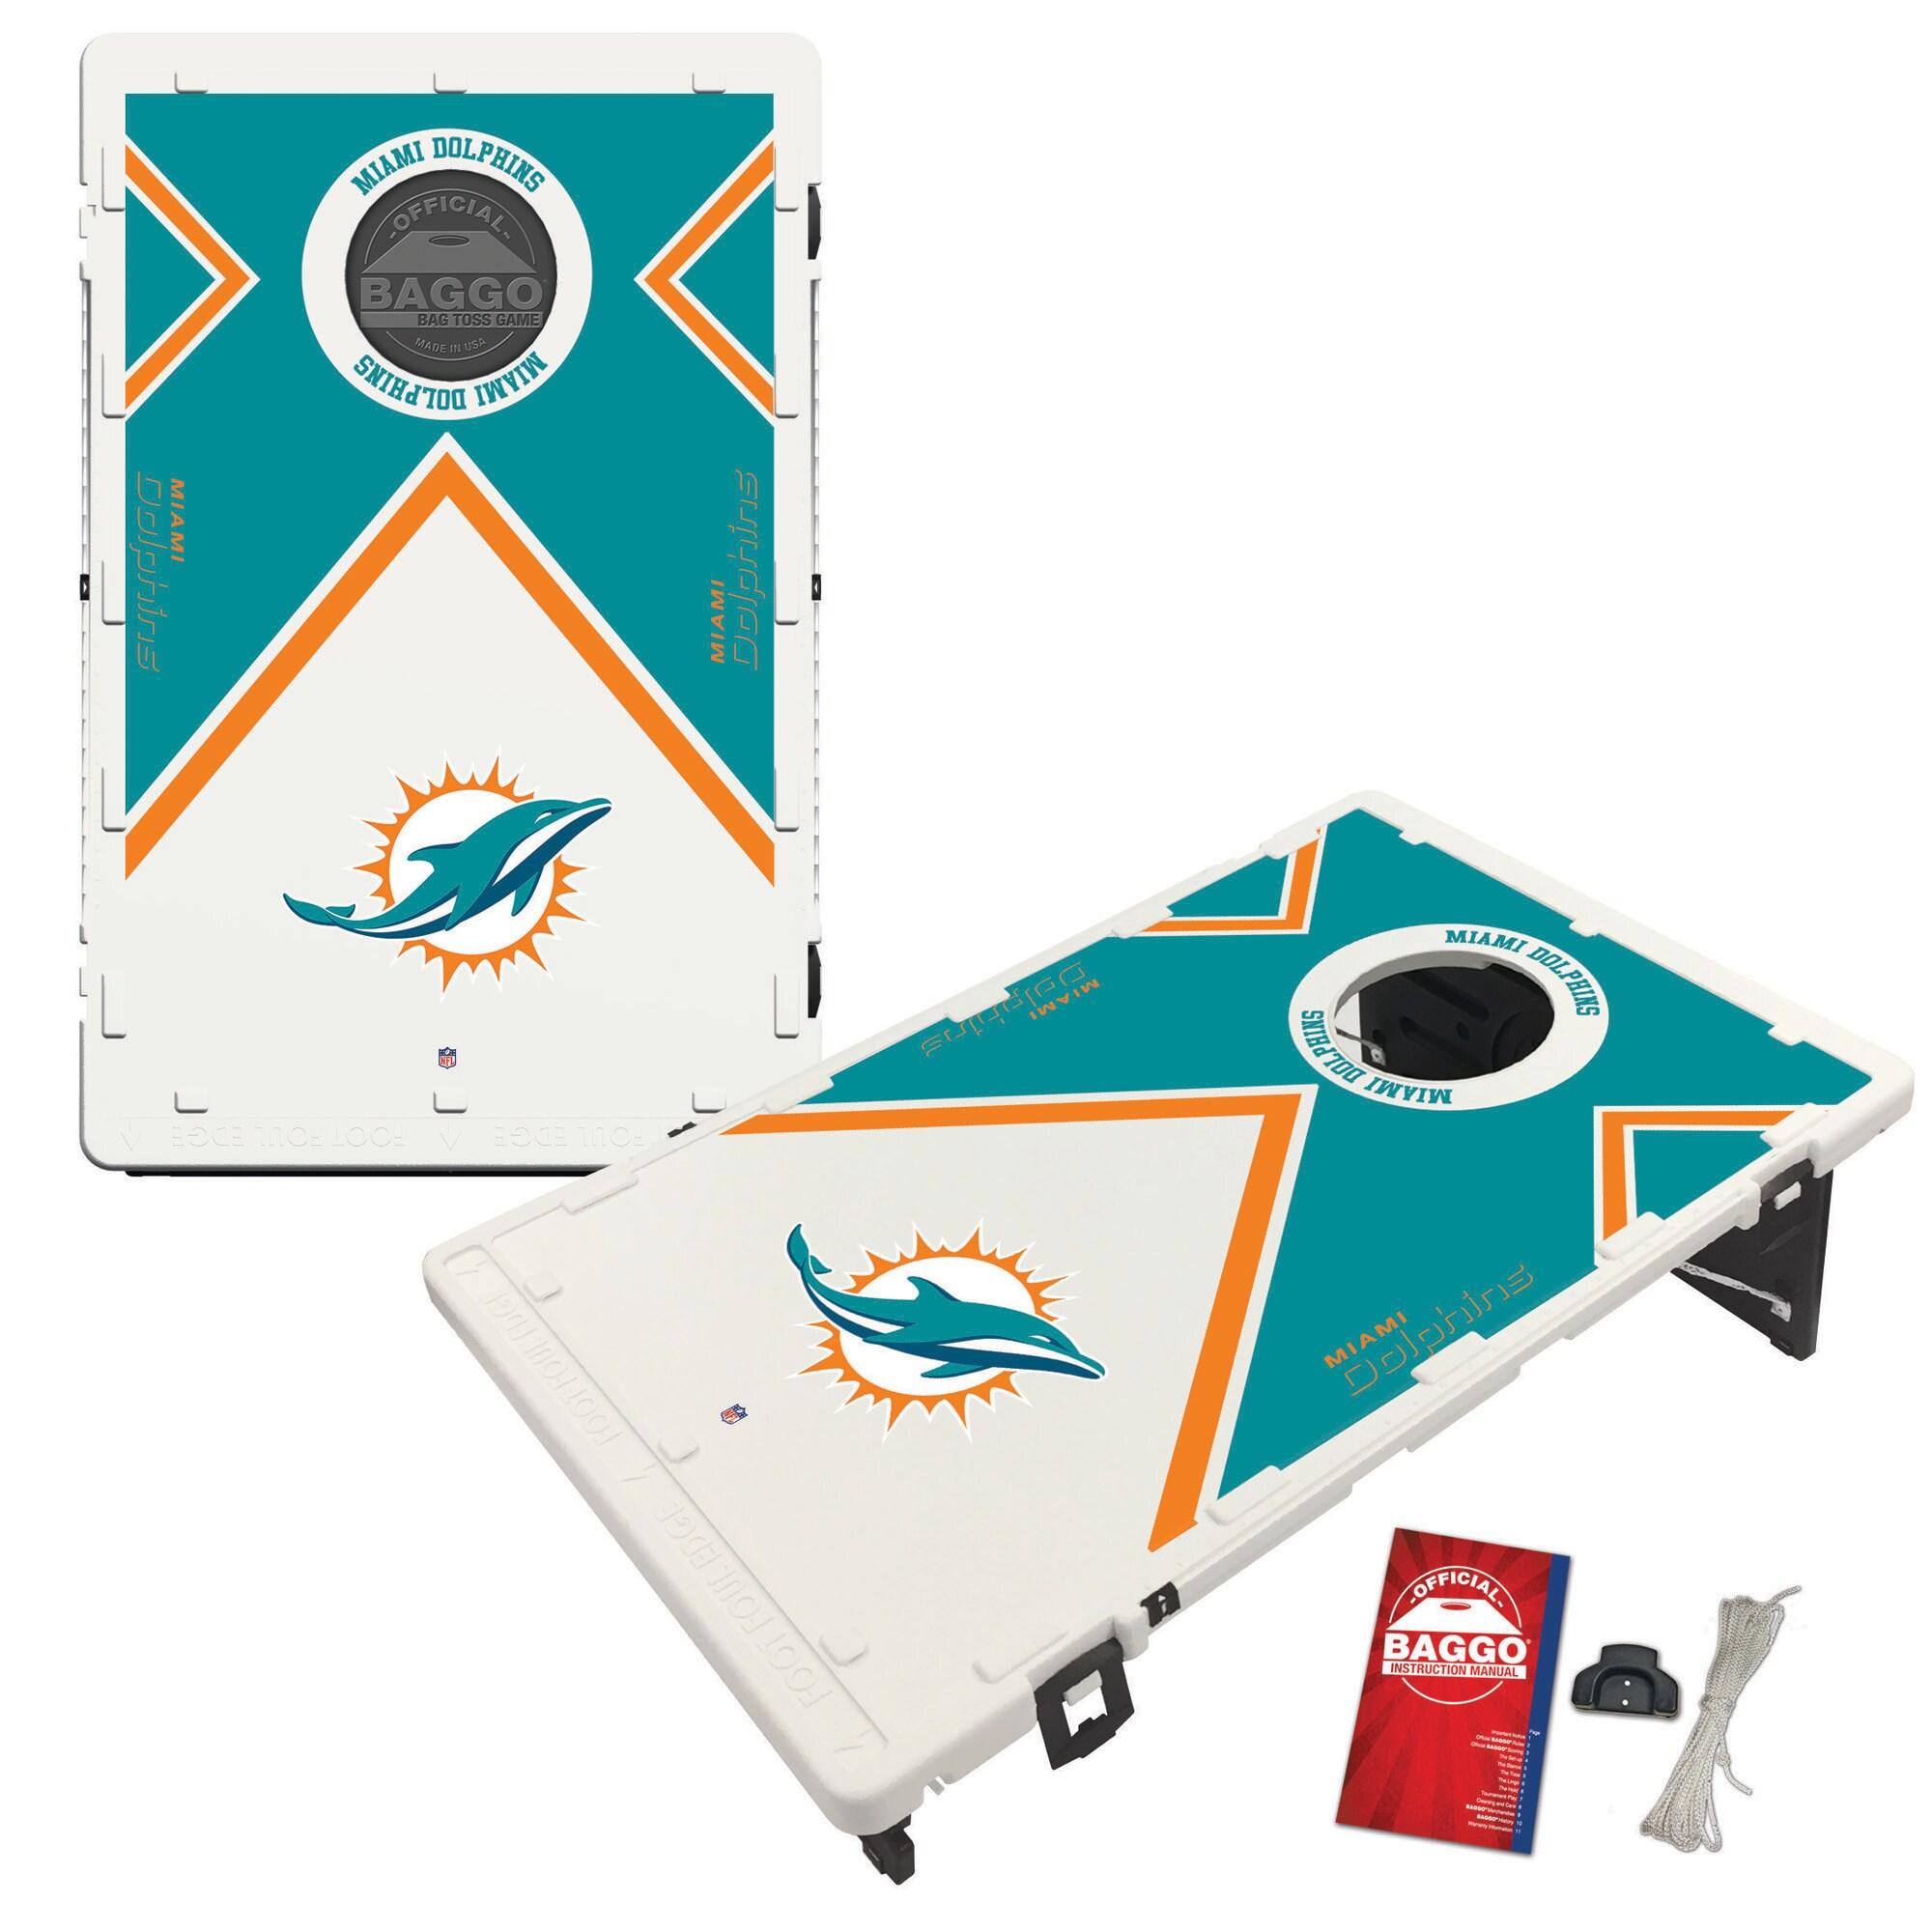 Miami Dolphins 2' x 3' BAGGO Vintage Cornhole Board Tailgate Toss Set